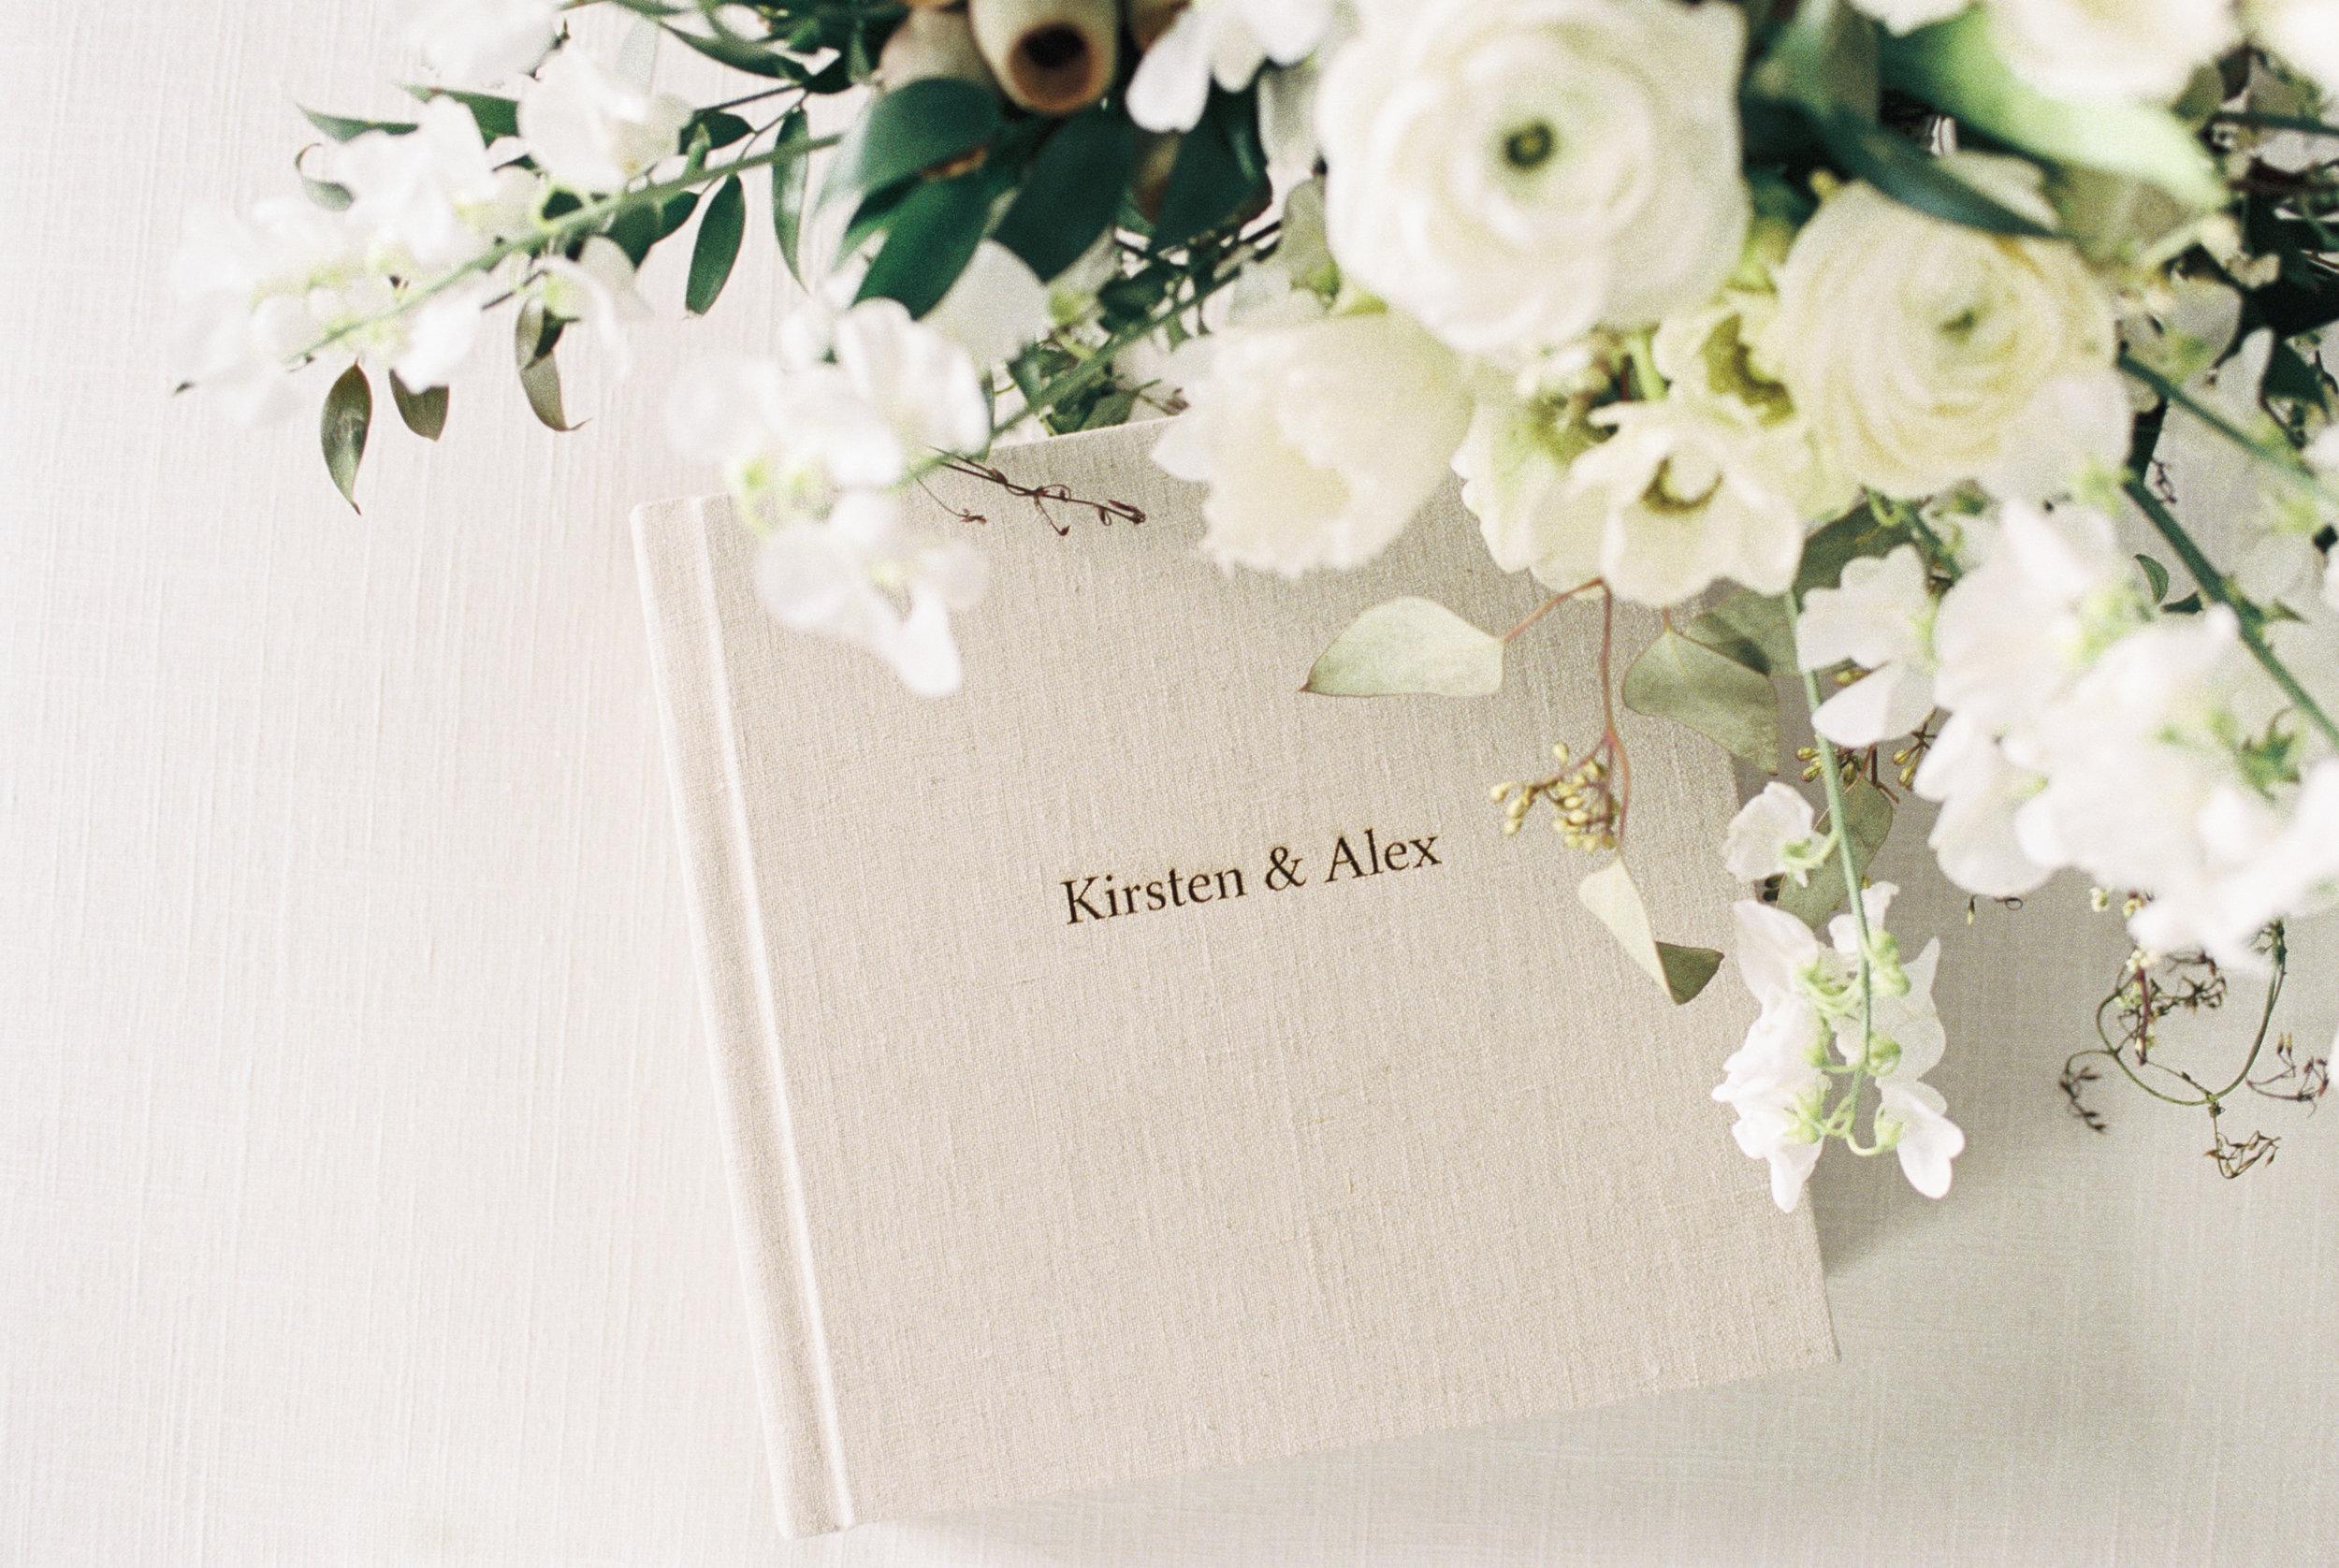 Boston Wedding Photographer Lynne Reznick Photography Heirloom Linen Wedding Album with Engraving